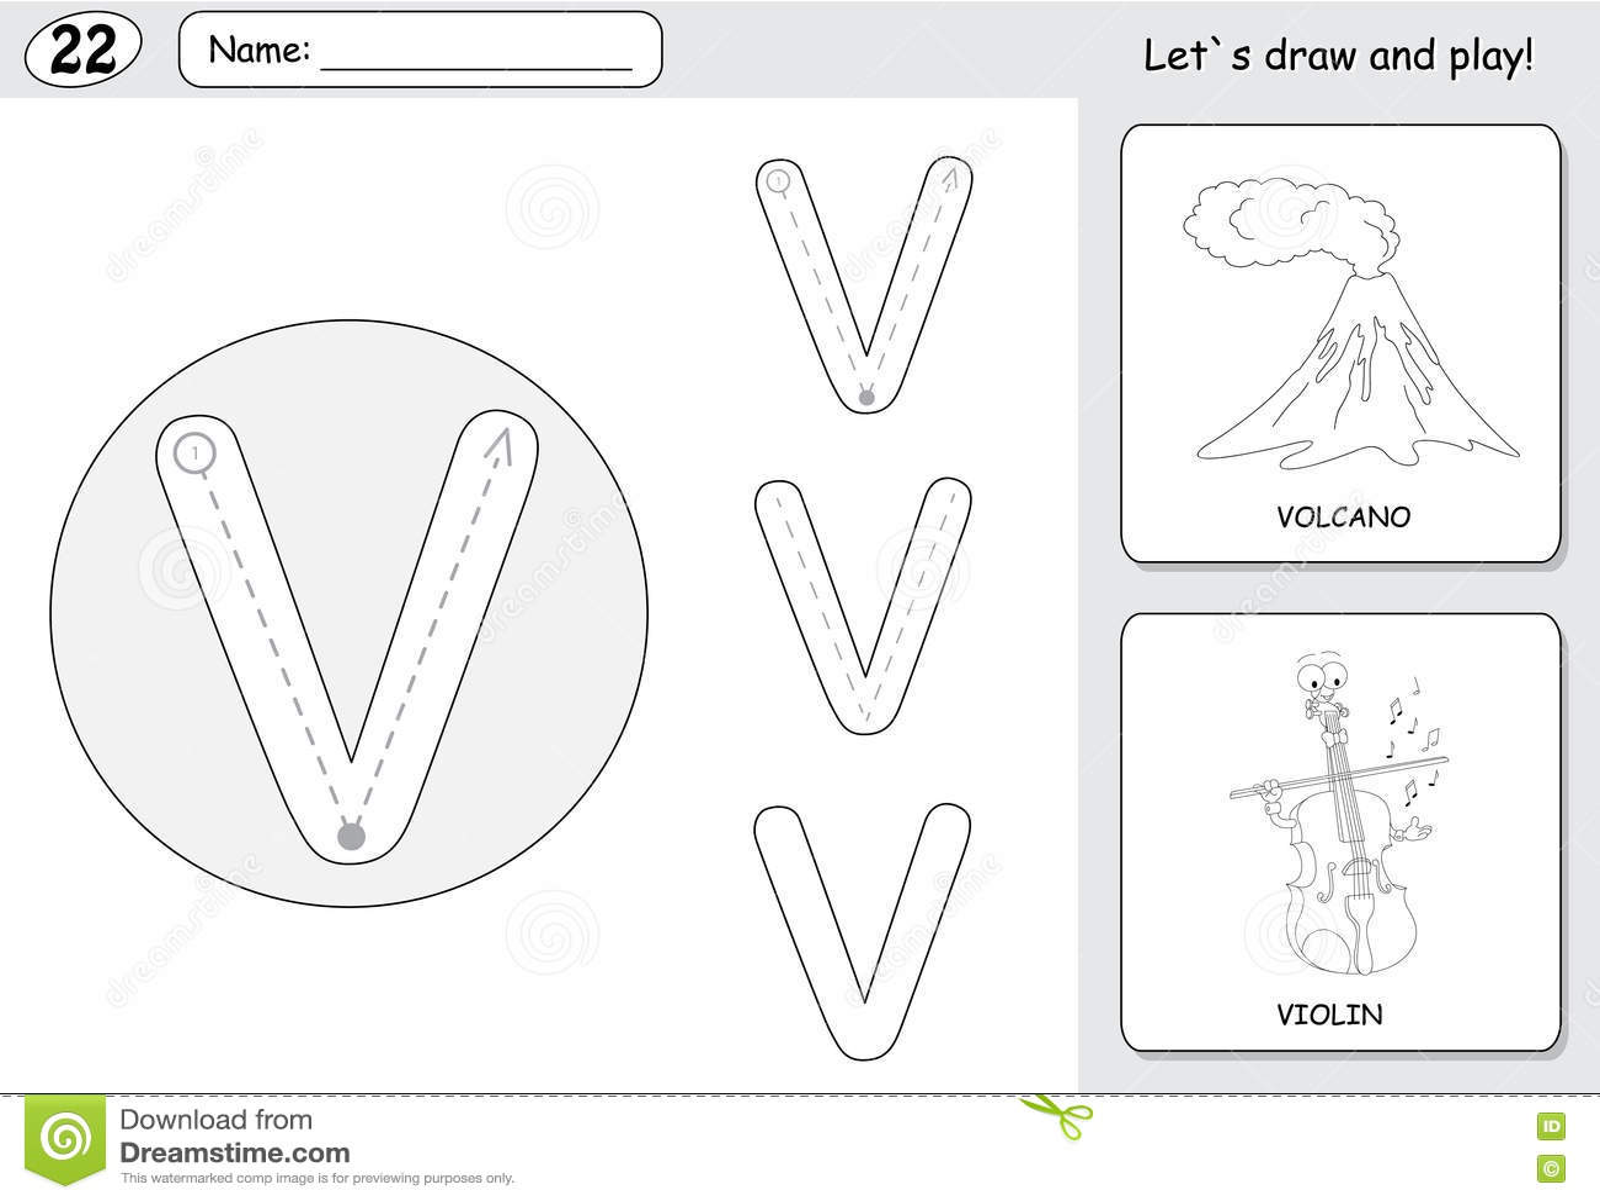 Cartoon Volcano And Violin. Alphabet Tracing Worksheet ...